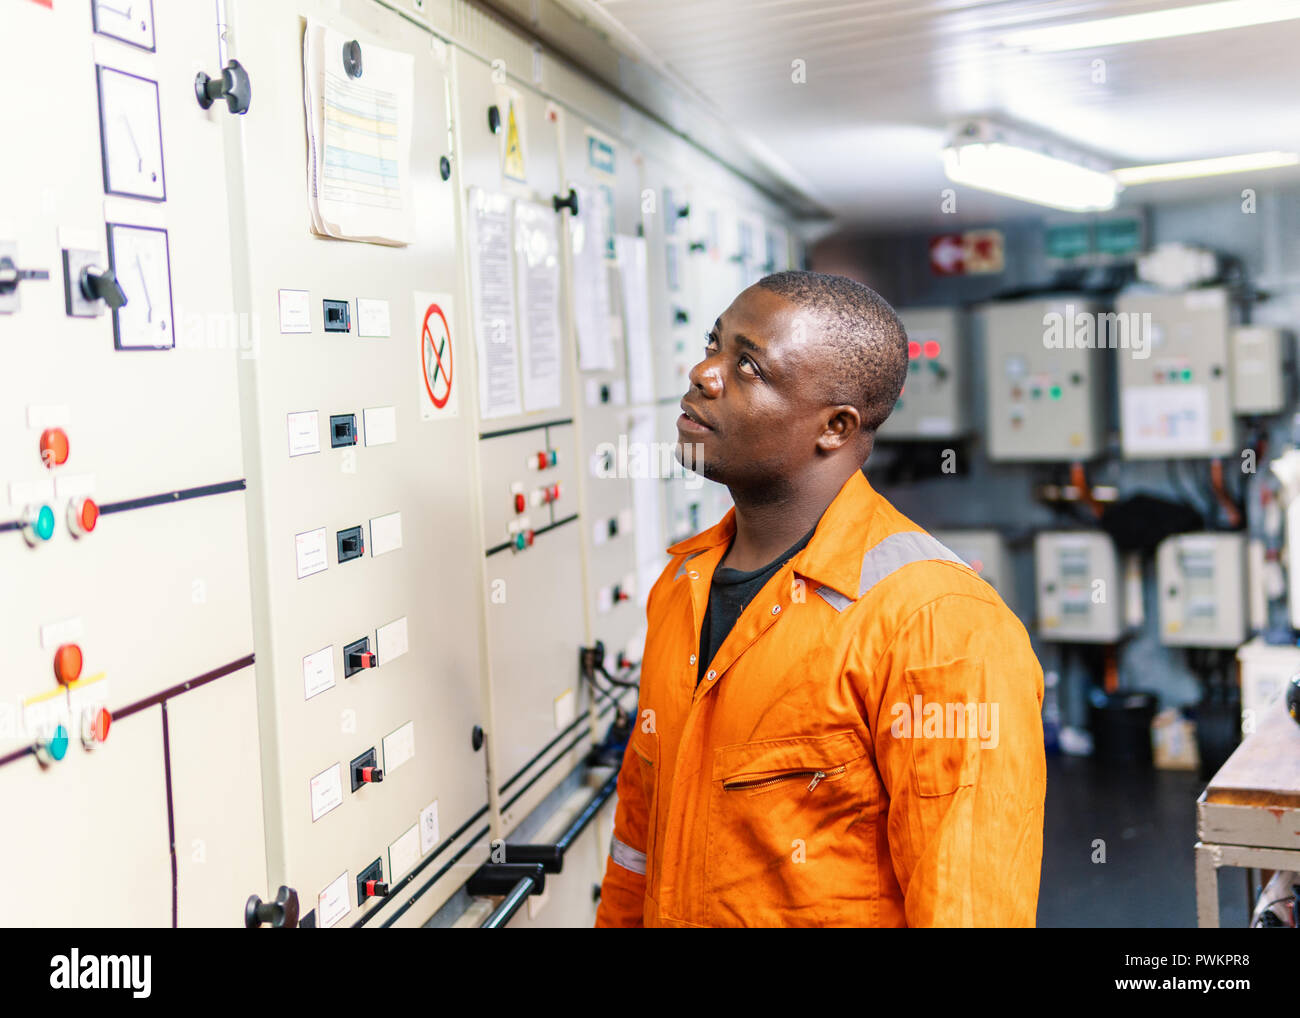 Marine Offizier im Maschinenraum arbeiten Stockbild